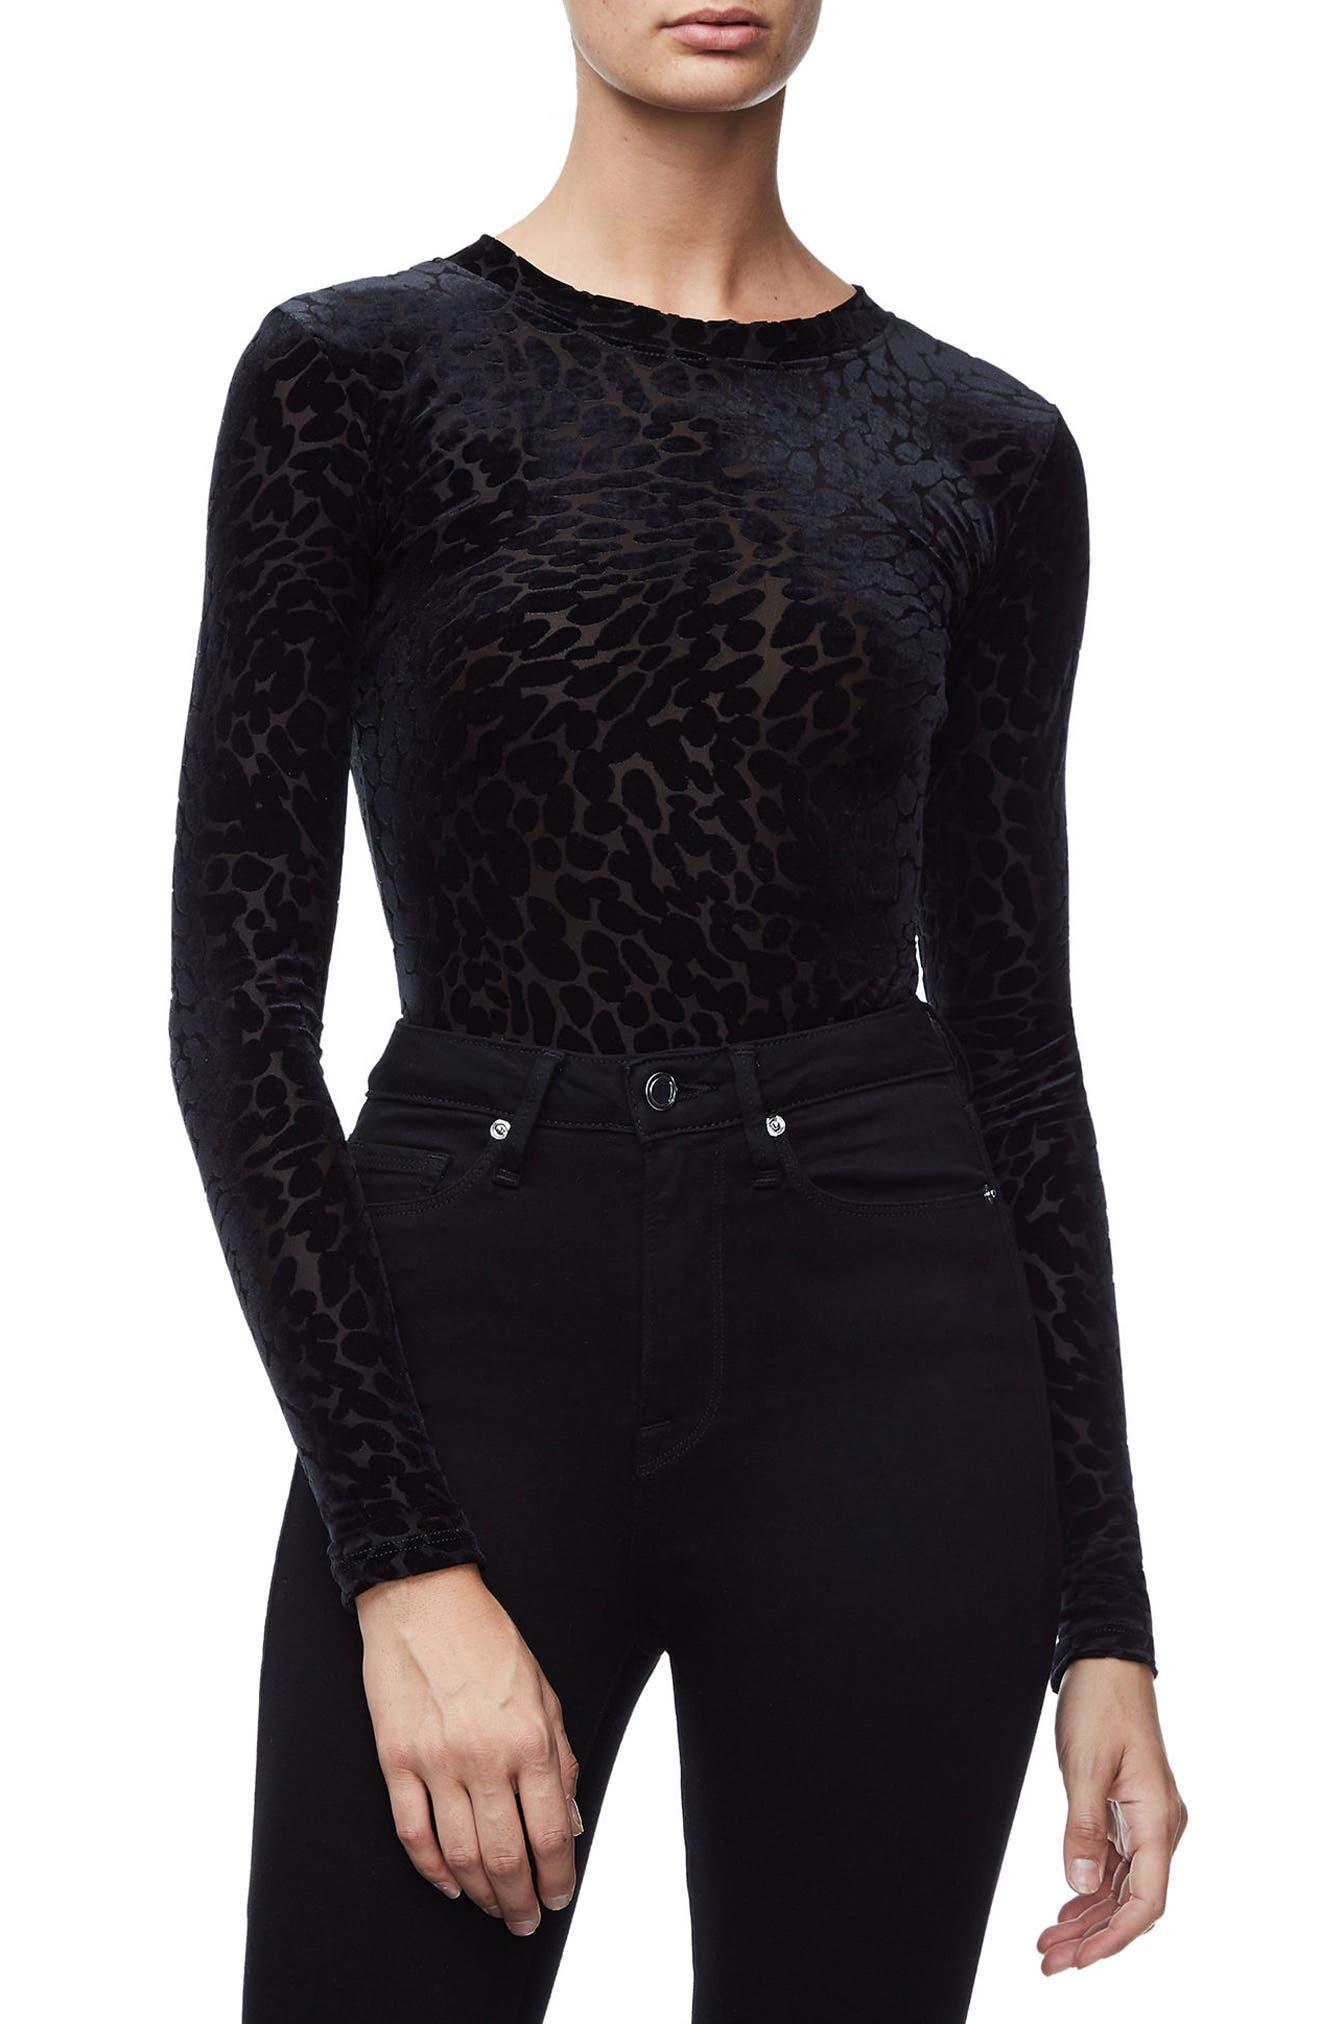 The Wilder One Bodysuit,                         Main,                         color, Black001